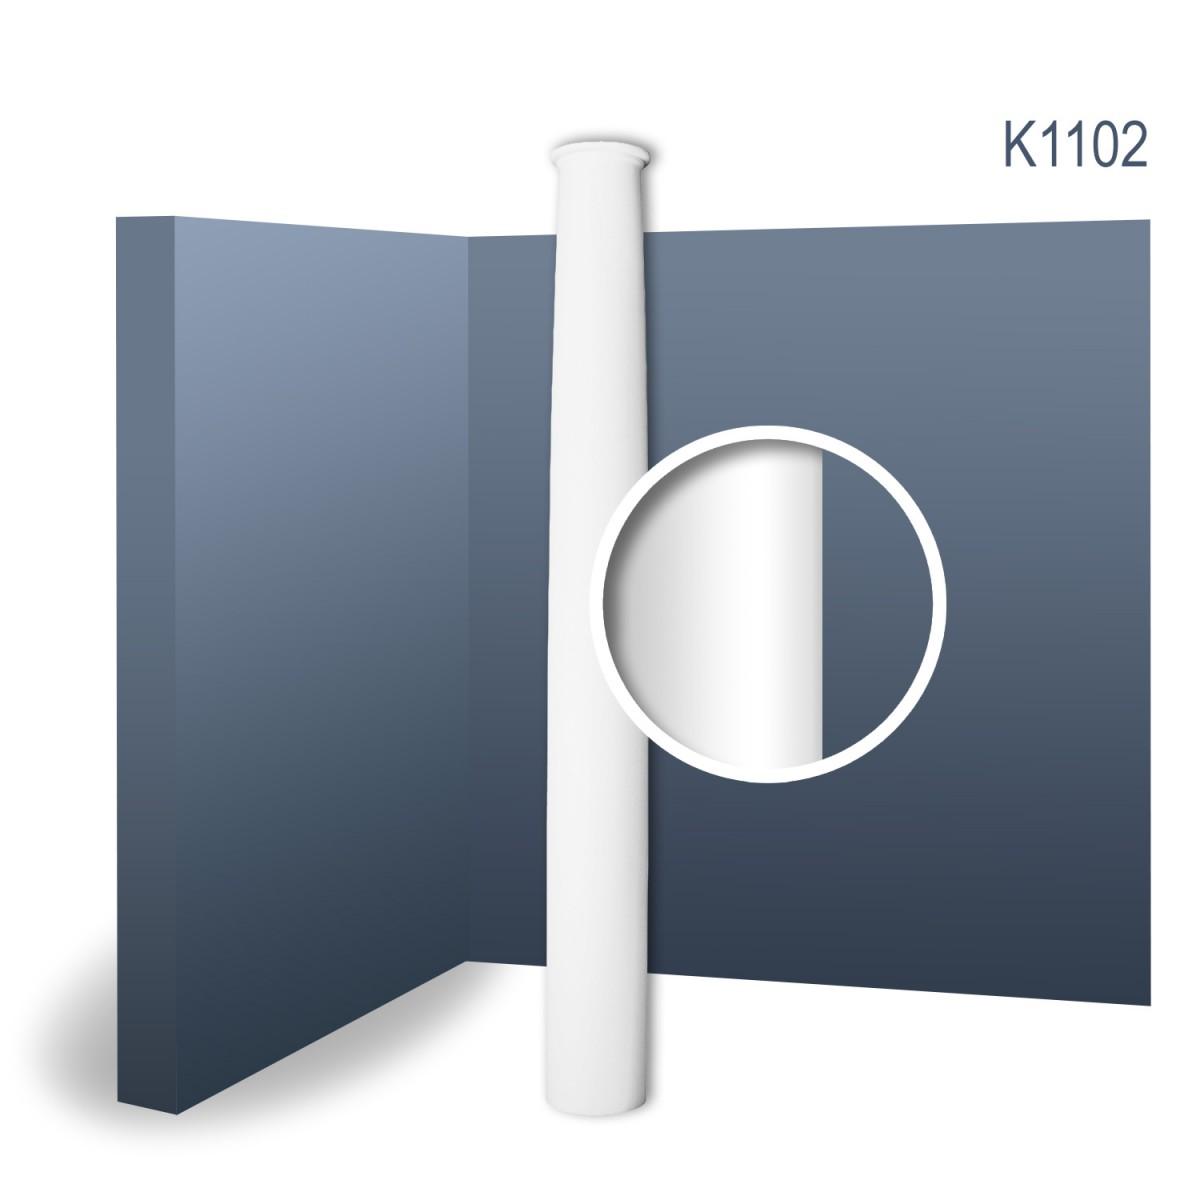 Coloana Intreaga Luxxus K1102, Dimensiuni: 22 X 22 X 202 cm, Orac Decor